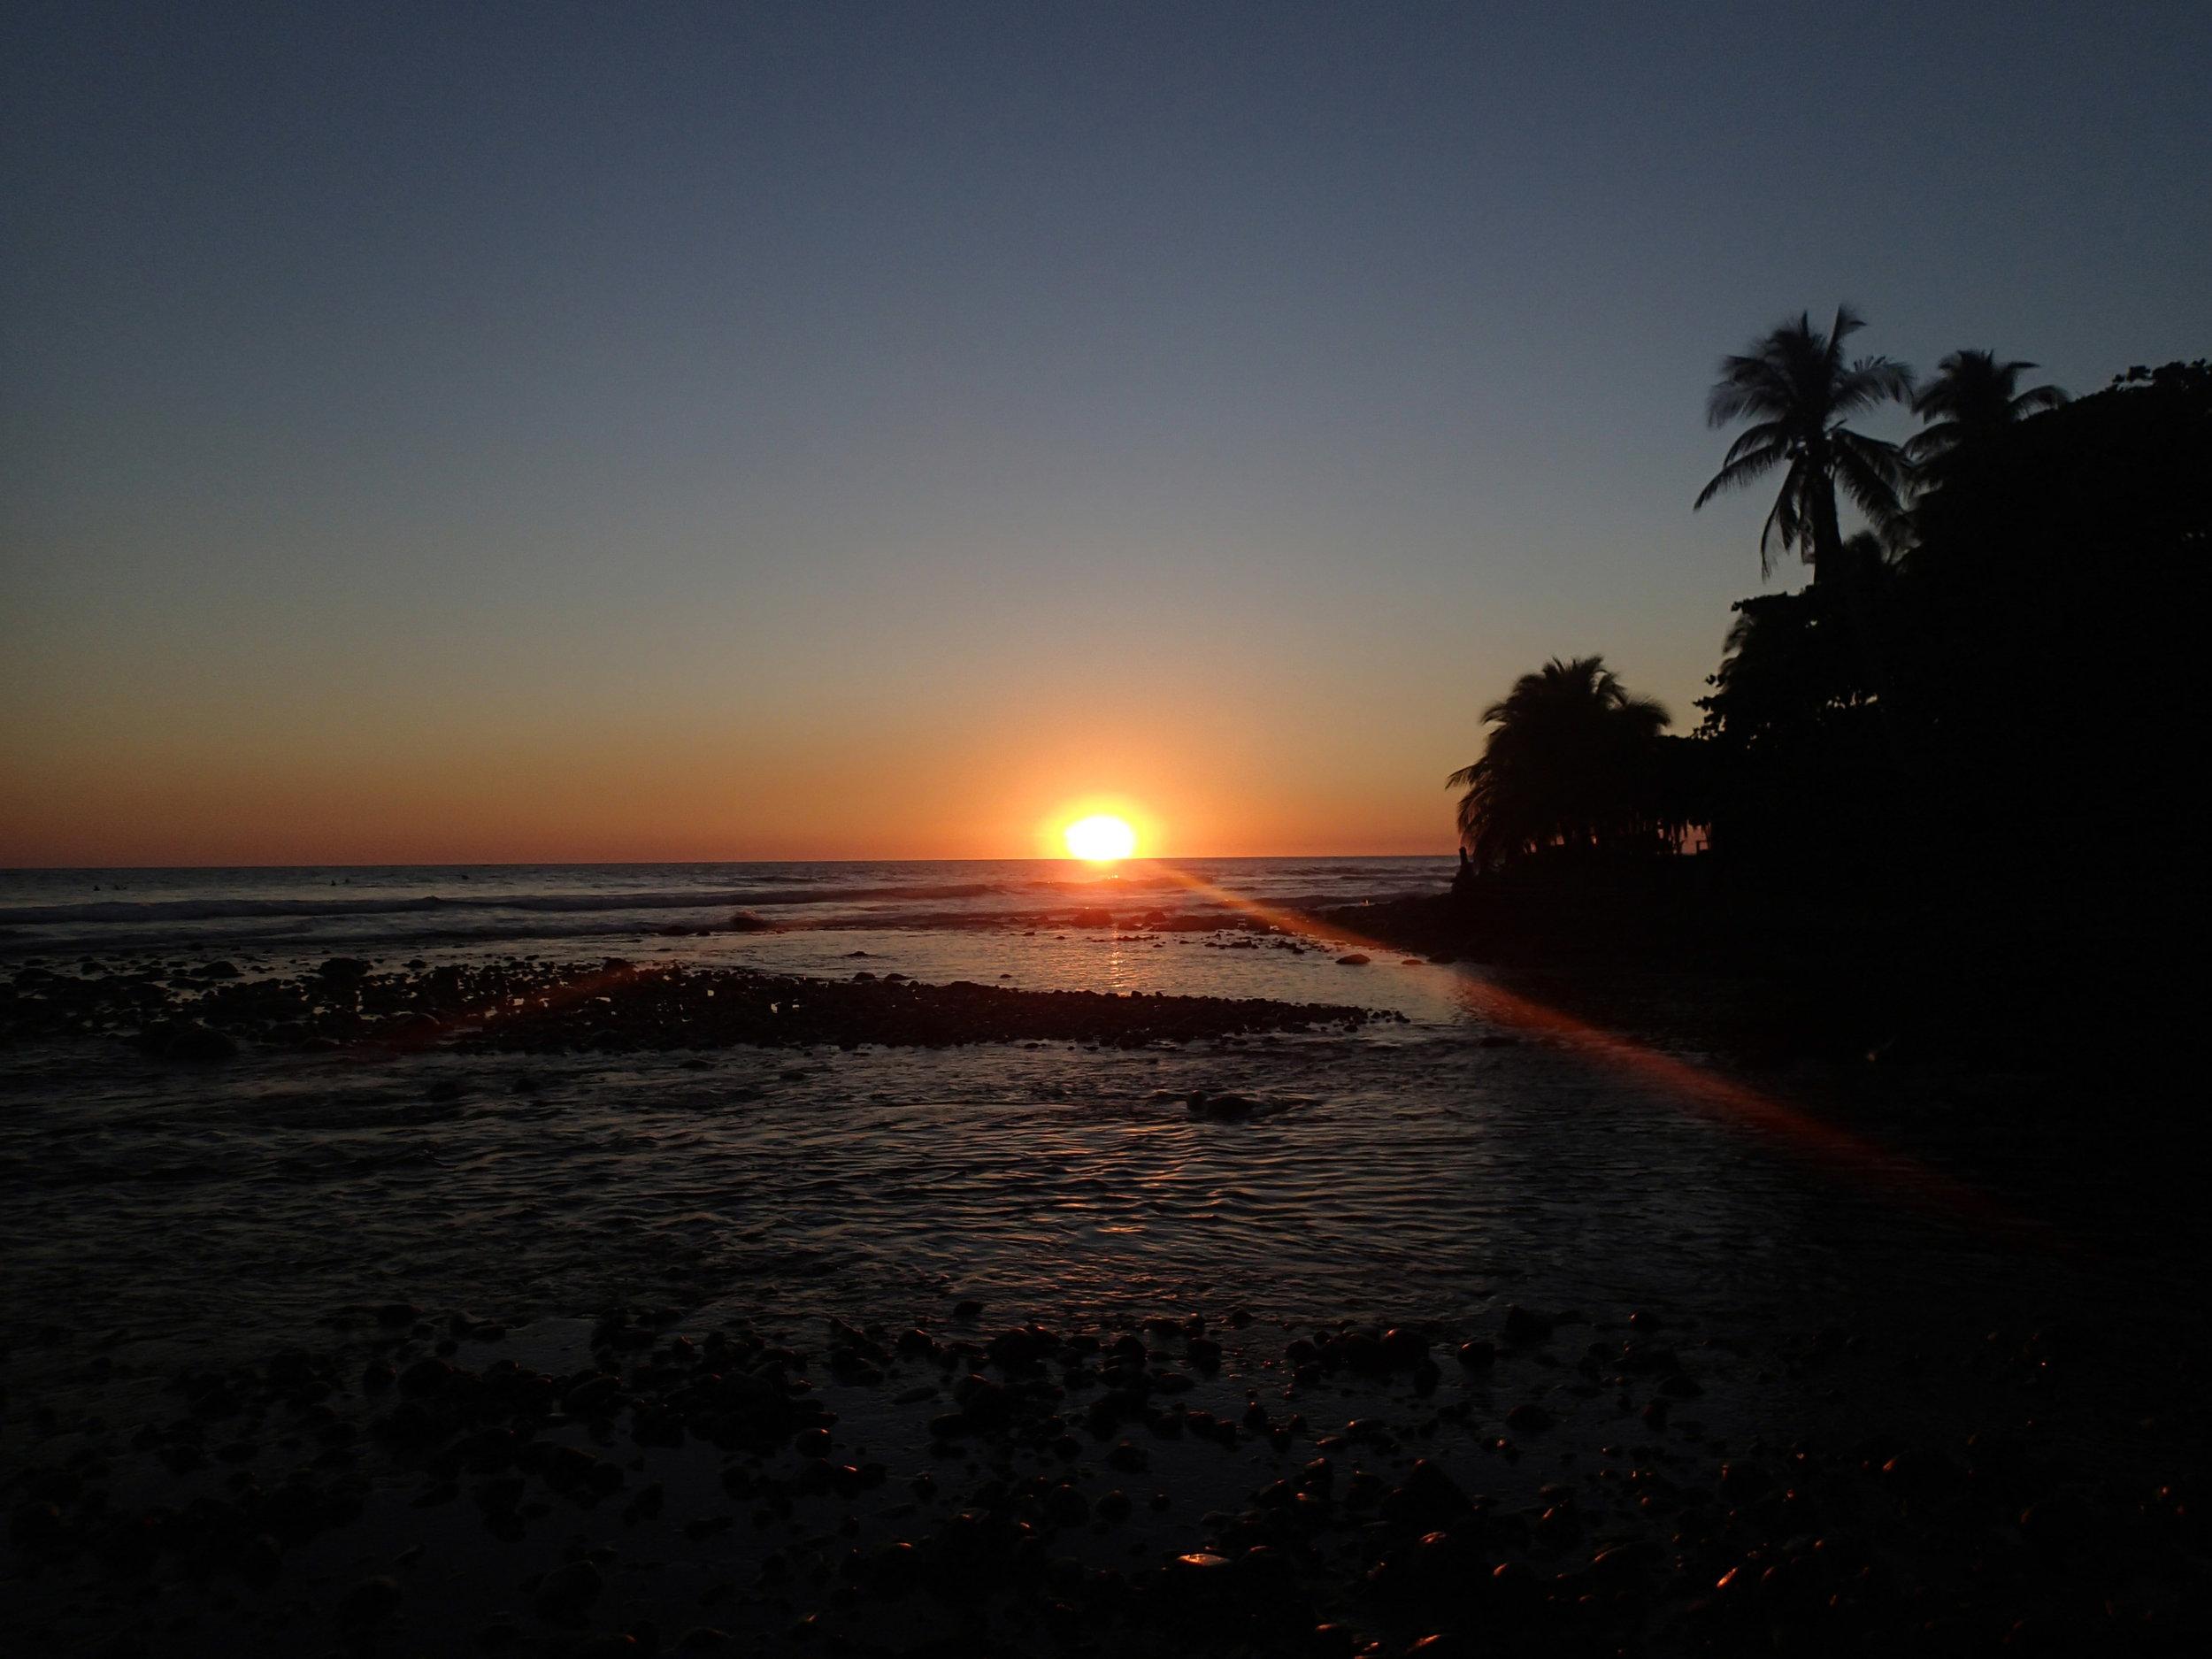 2014-12-8 sunset.jpg